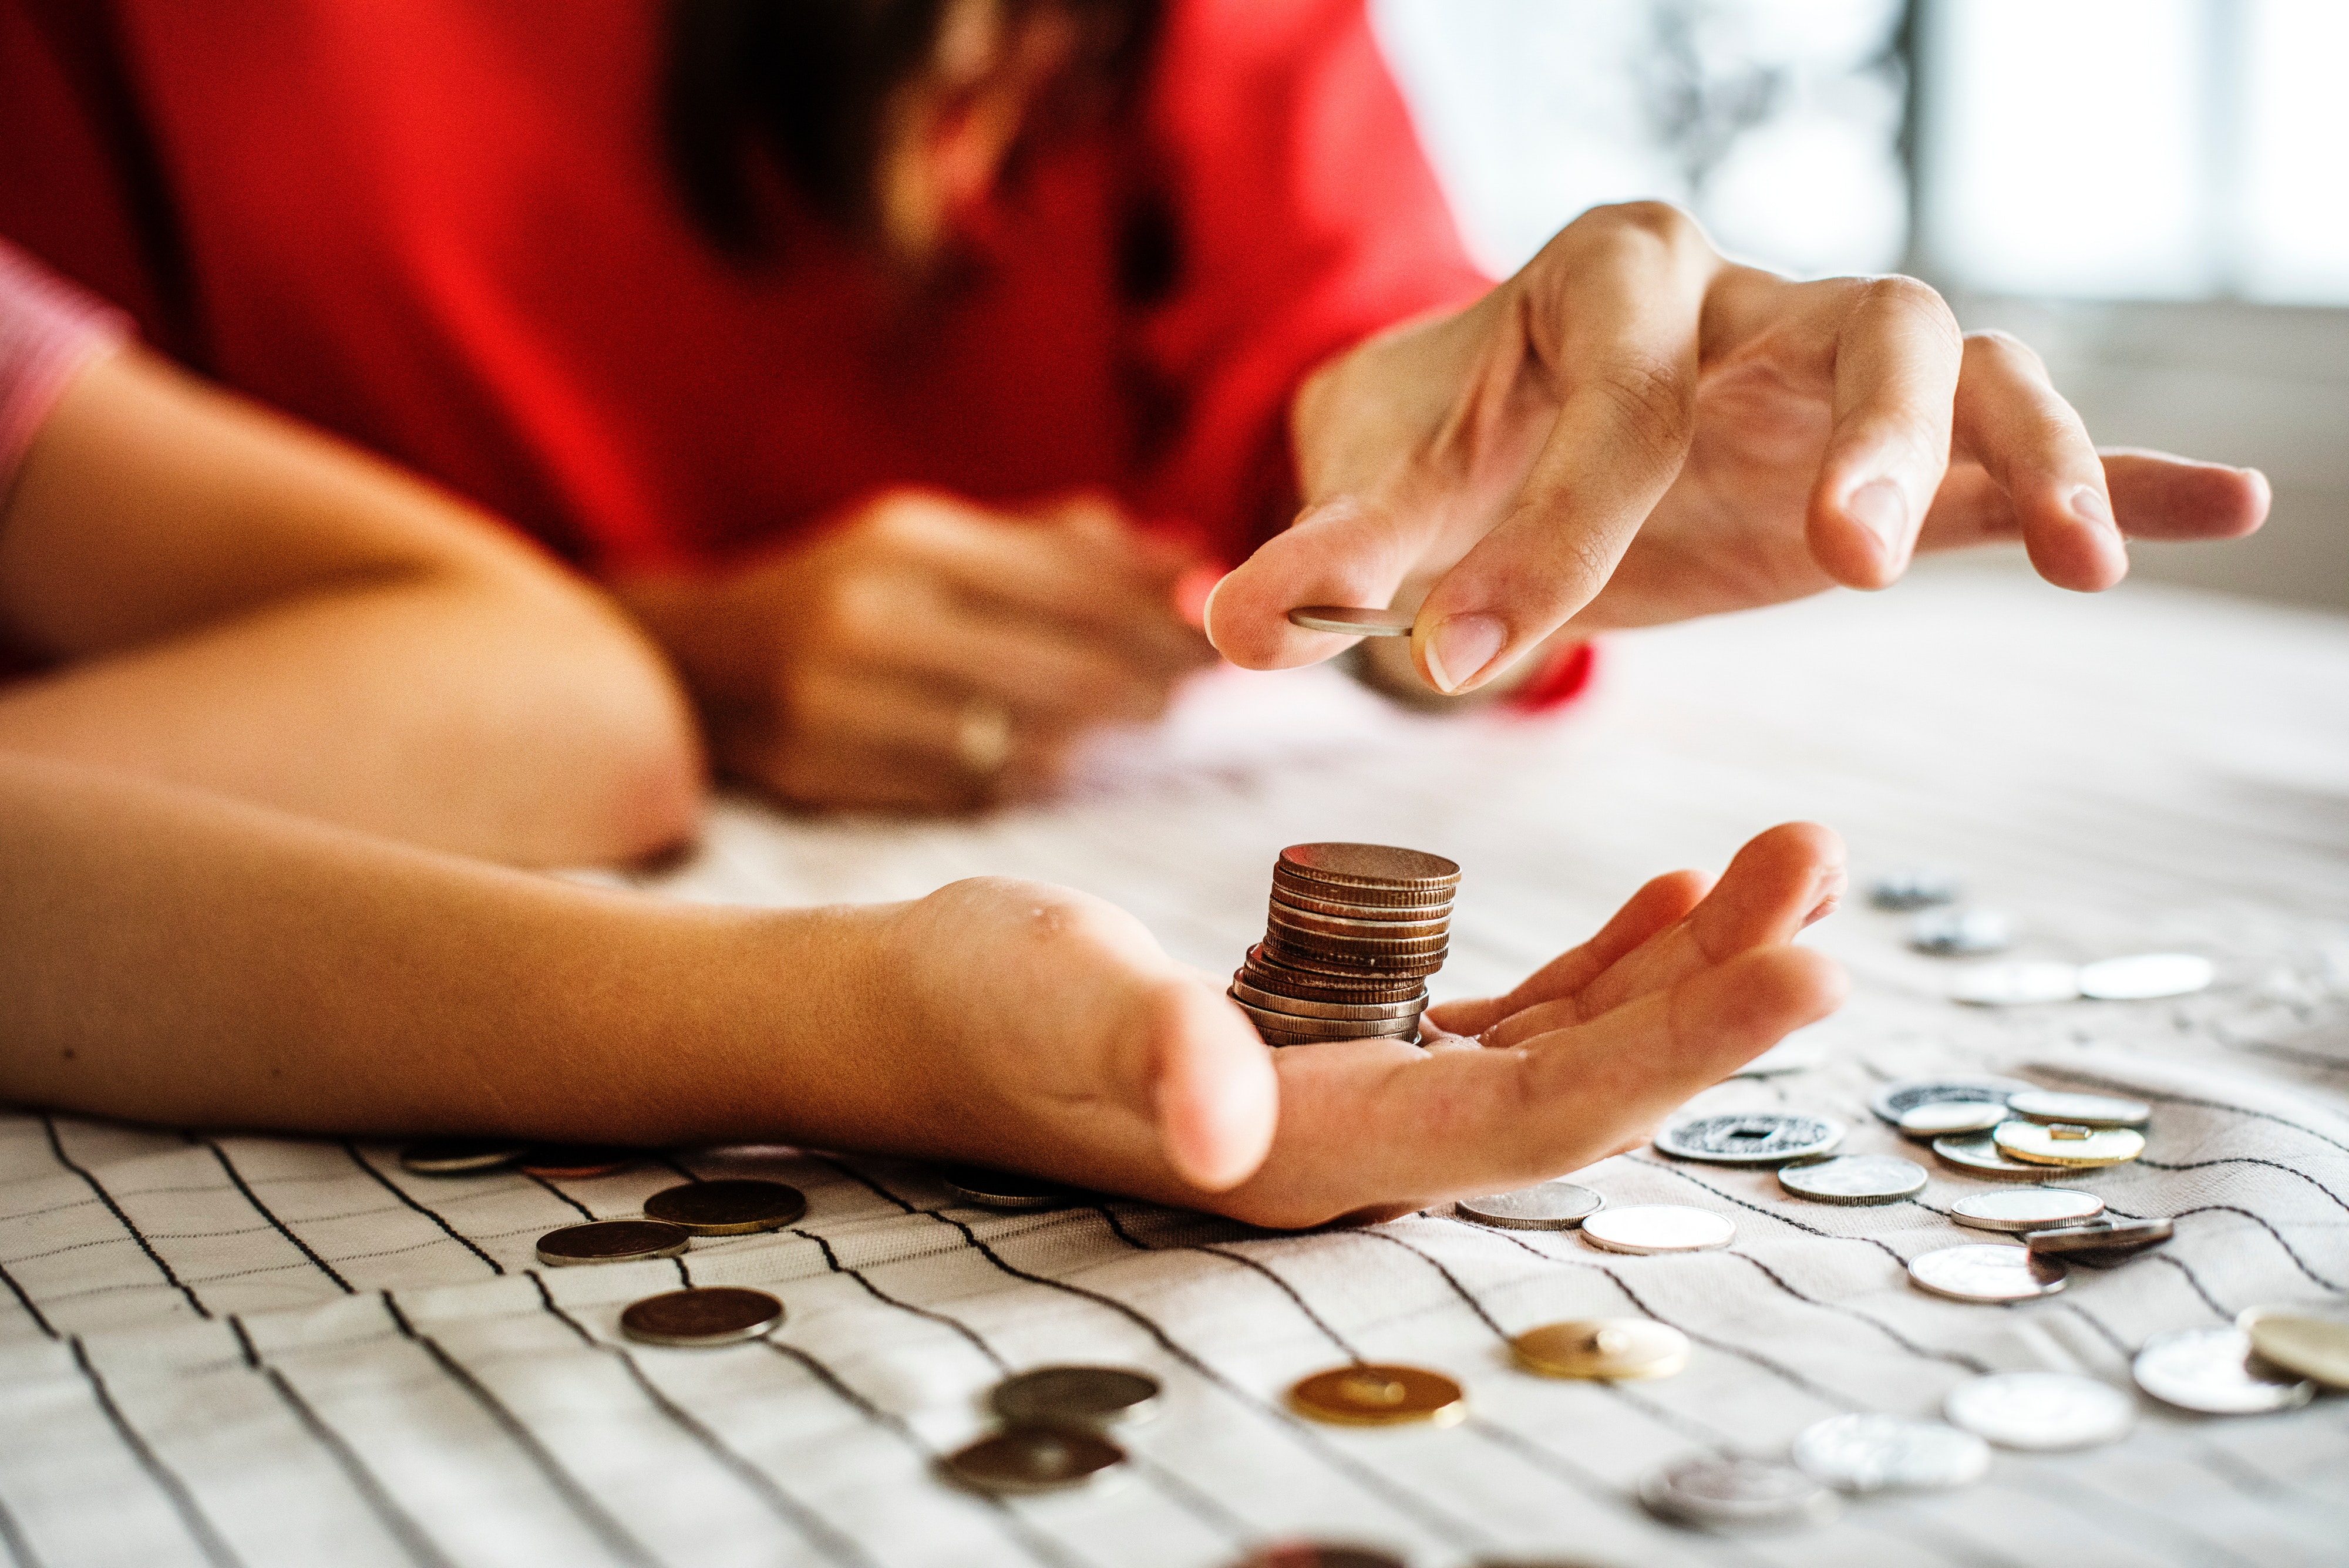 adult-banking-blur-1288483 (2)